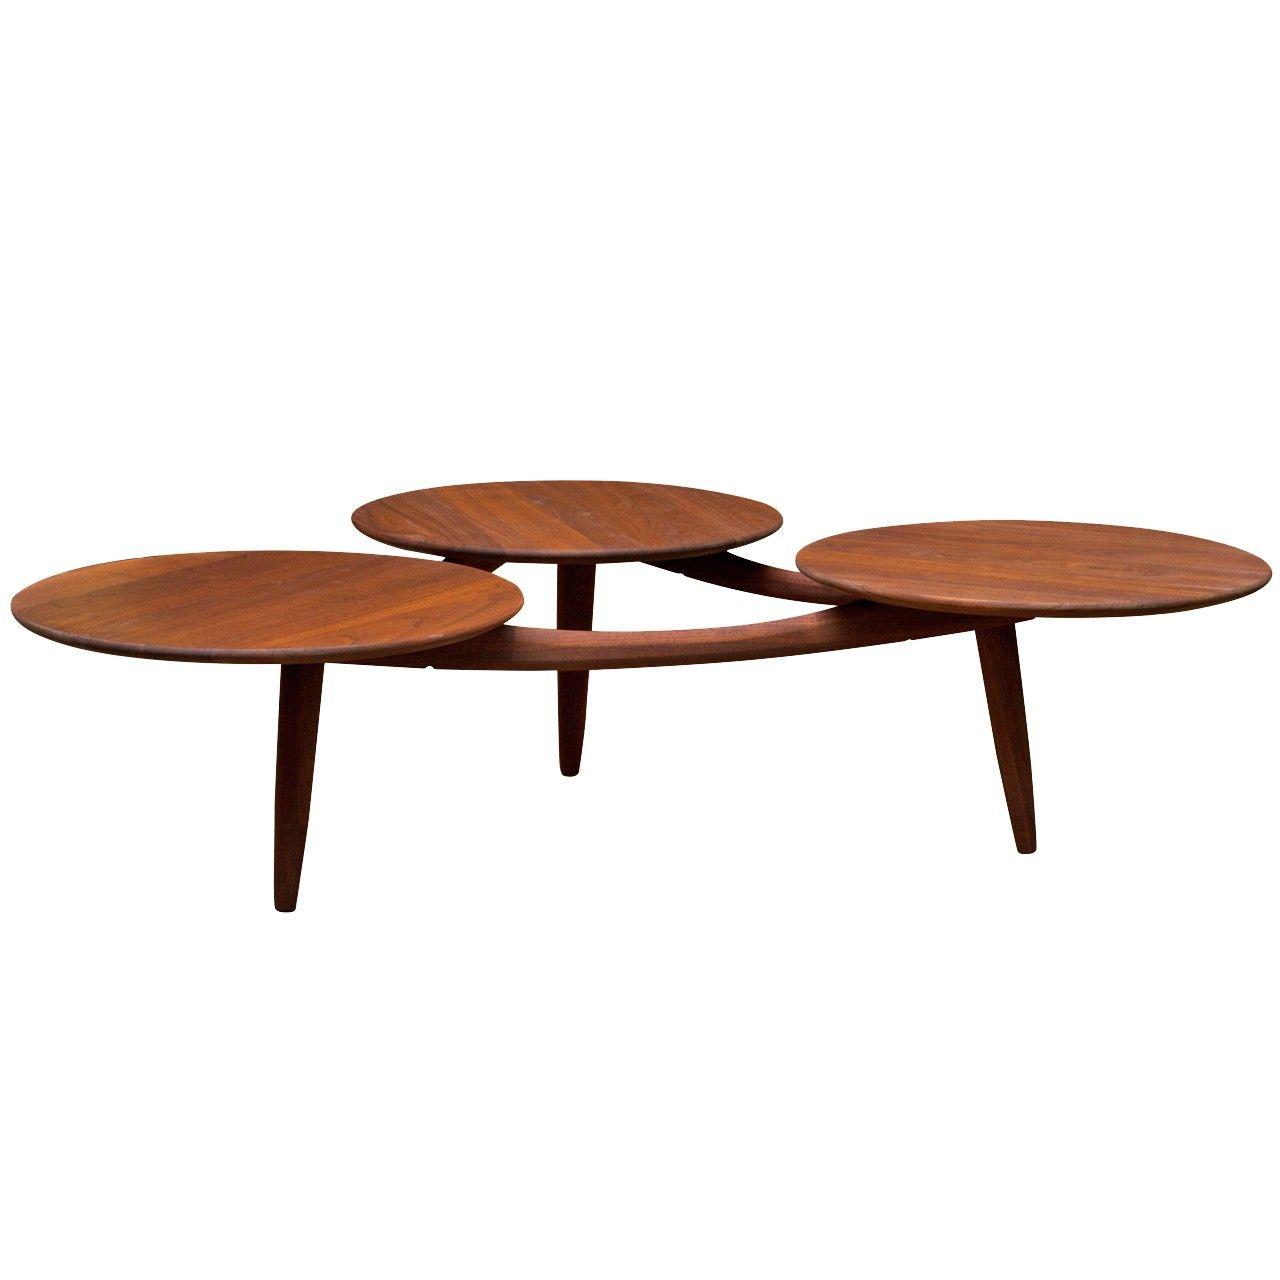 Mid Century Modern Home Design Mid Century Modern Coffee Table Book Mid Century Modern Coffee Table Round Coffee Table Modern Modern Glass Coffee Table [ 1280 x 1280 Pixel ]